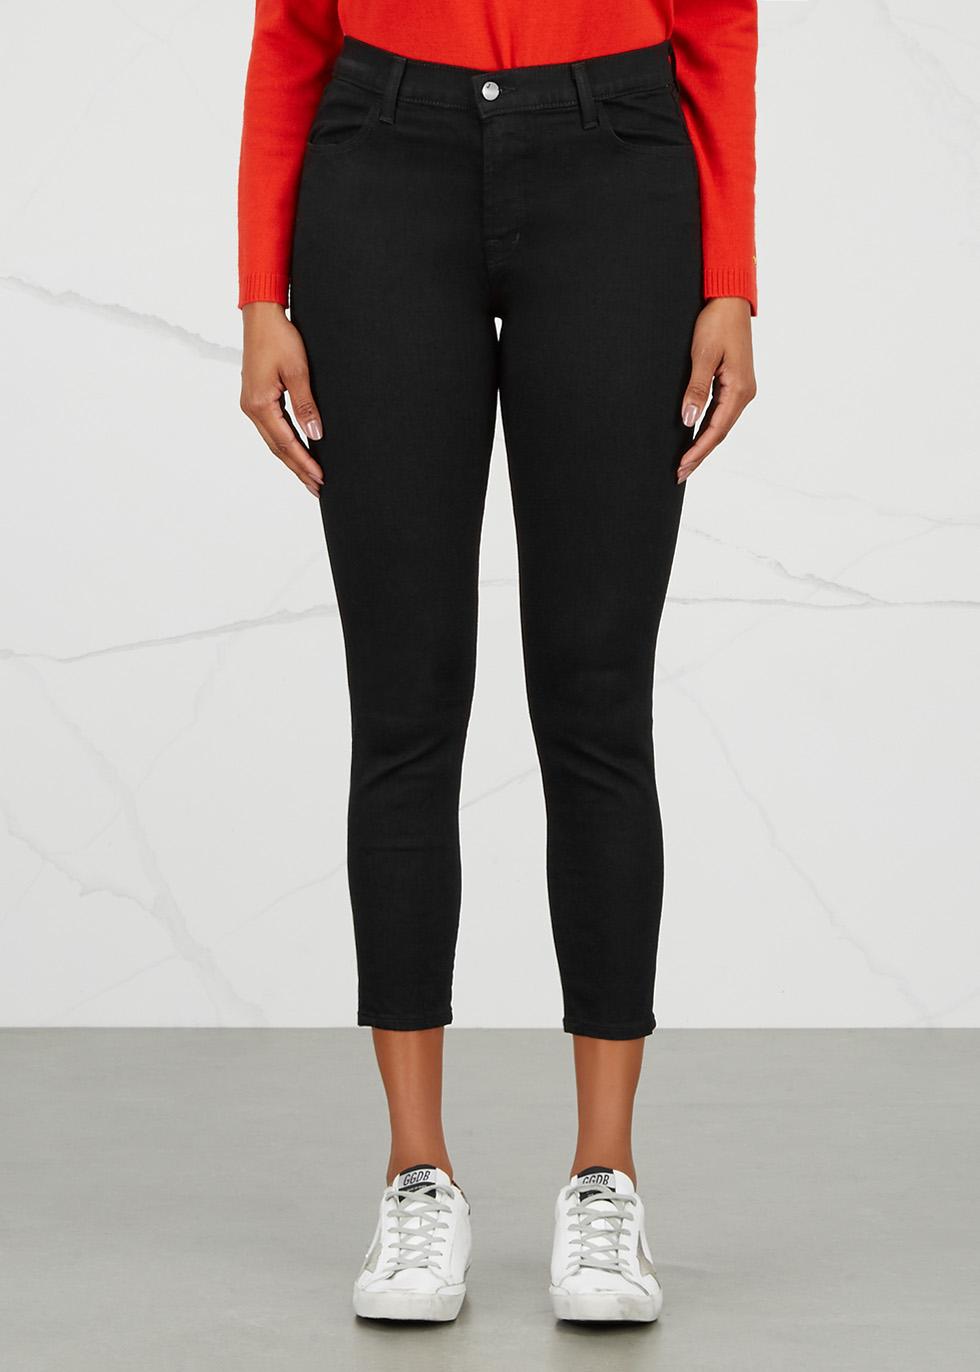 Alana black cropped skinny jeans - J Brand